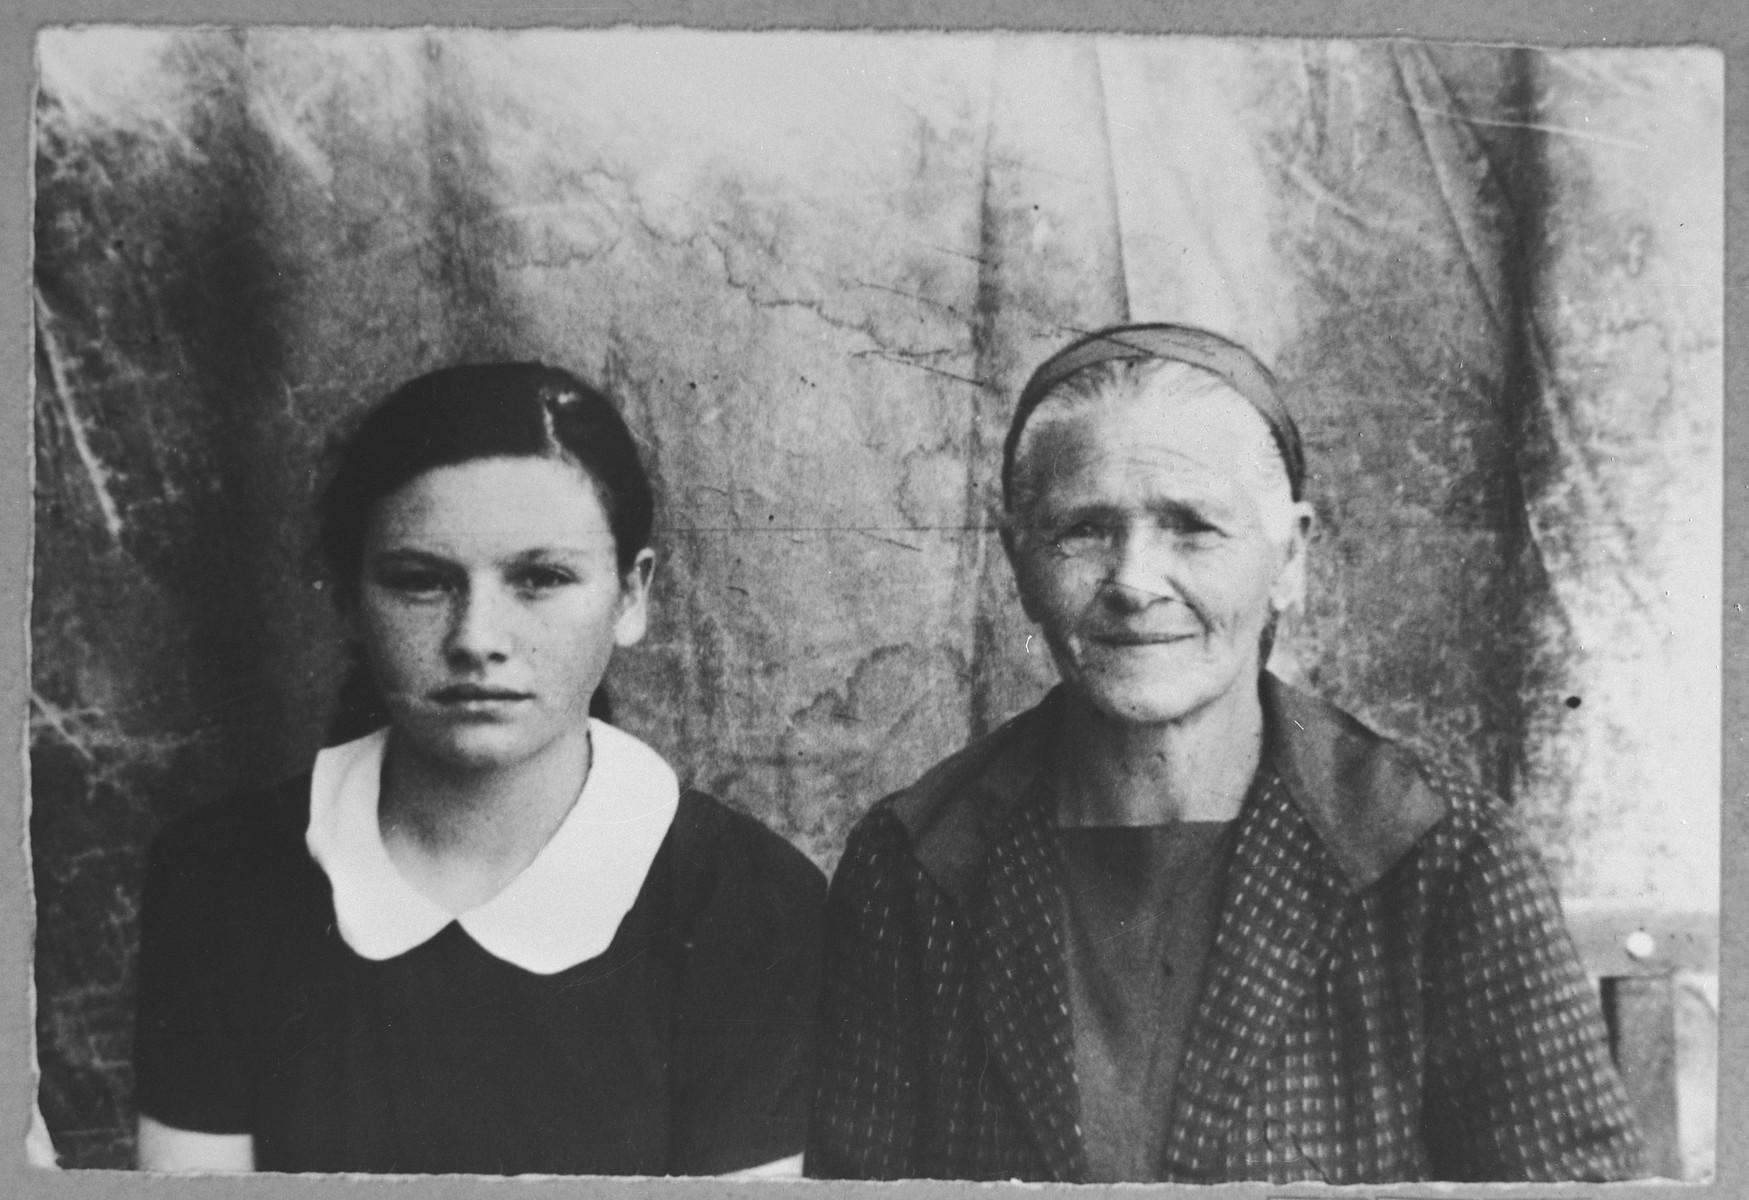 Portrait of Hana Nachmias, wife of Yakov Nachmias, and Buena Nachmias, daughter of Yakov Nachmias.  Buena was a waitress.  They lived at Orisarska 6 in Bitola.